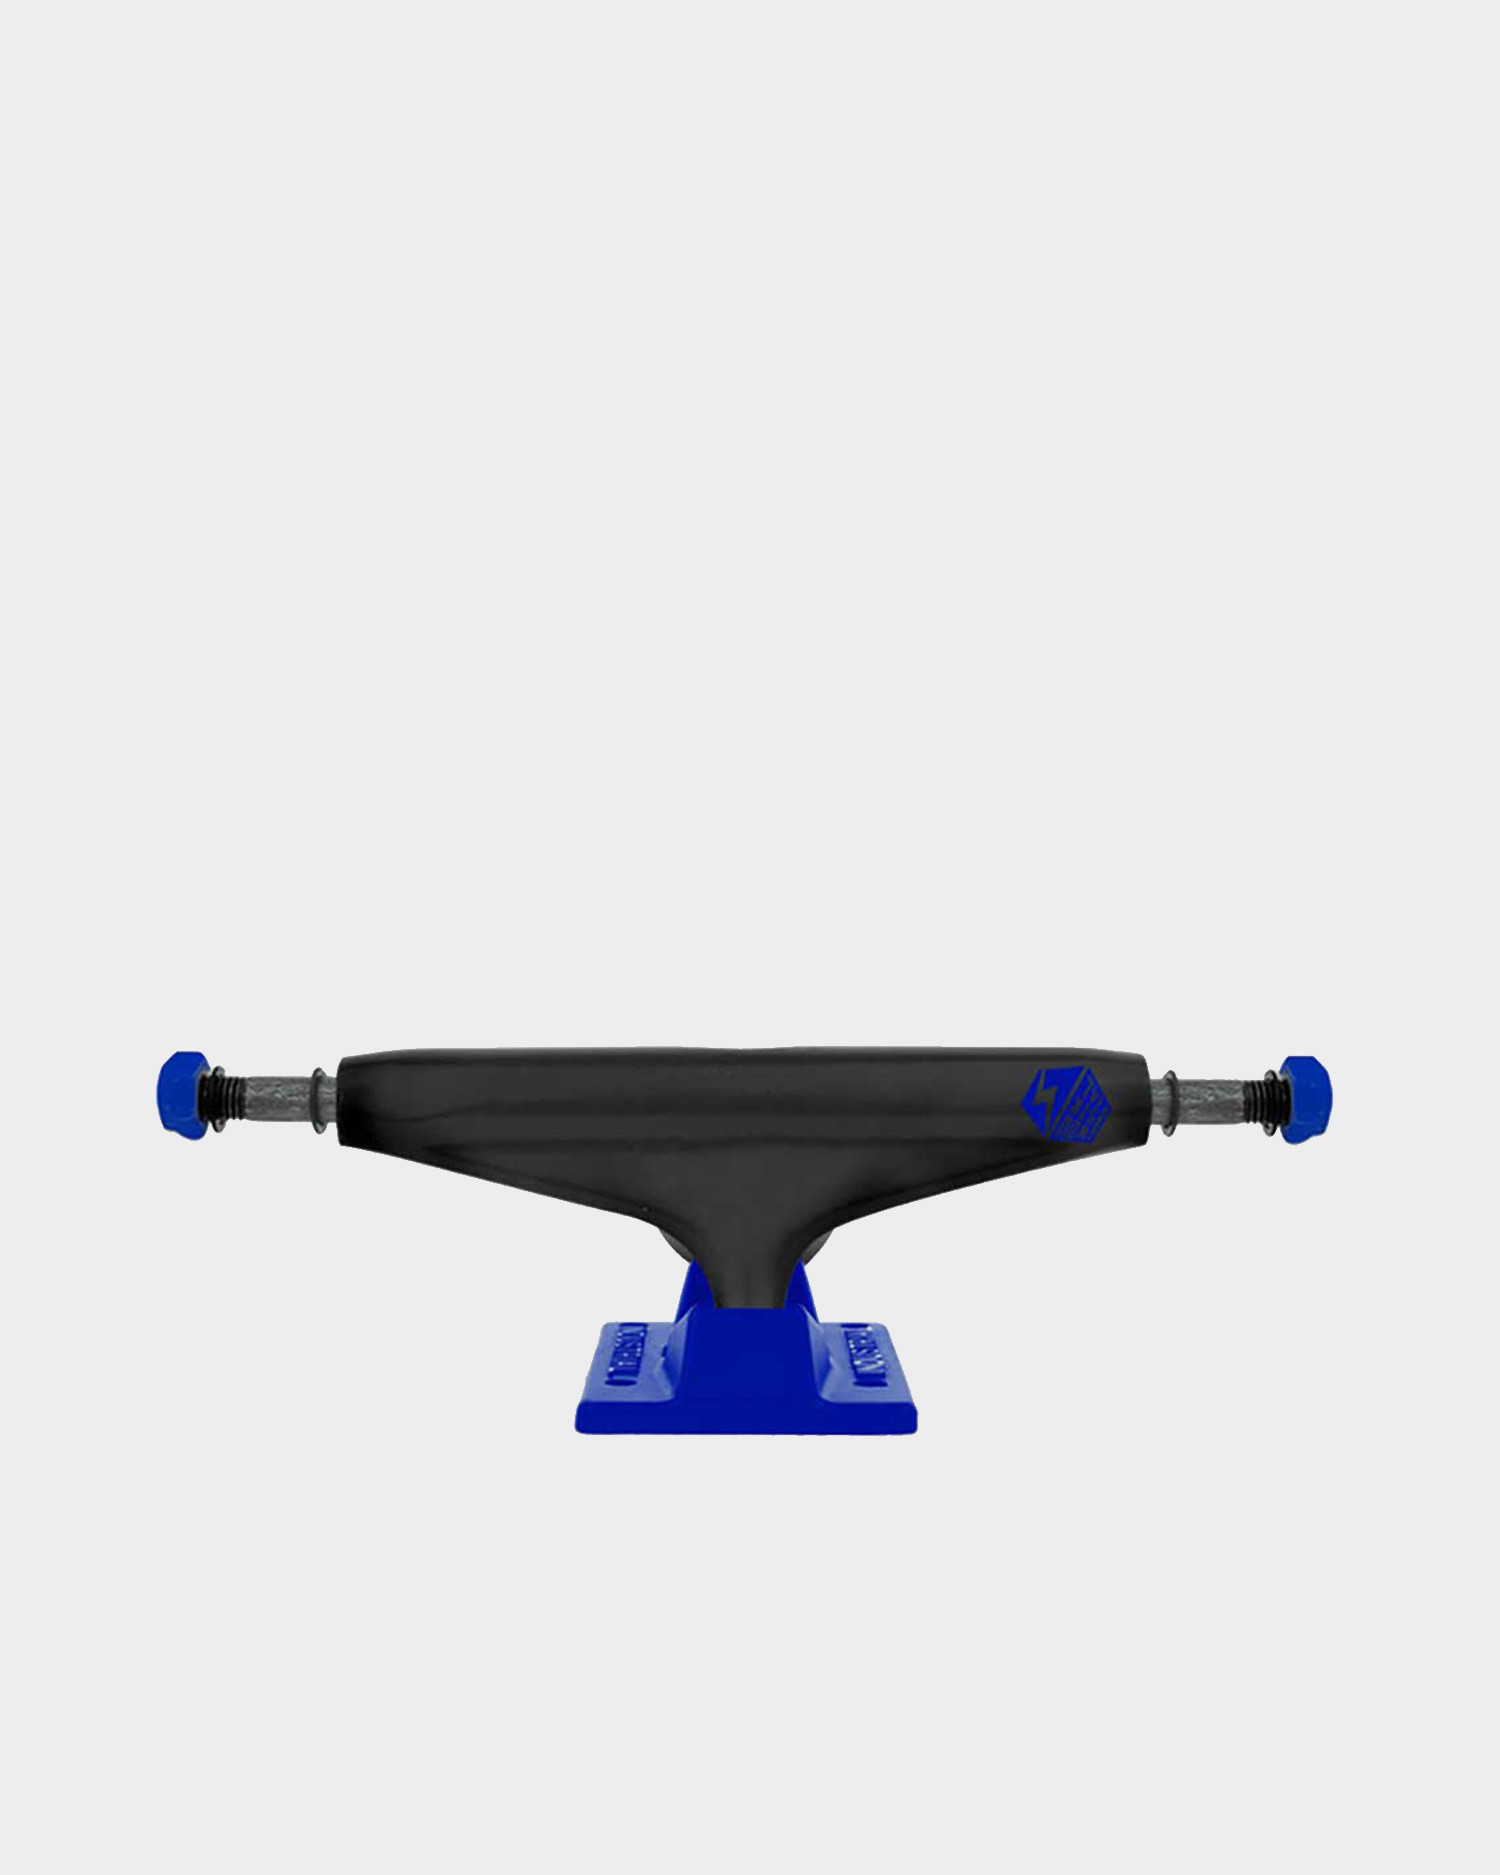 Industrial Truck 5.25 Electric Blue/Black